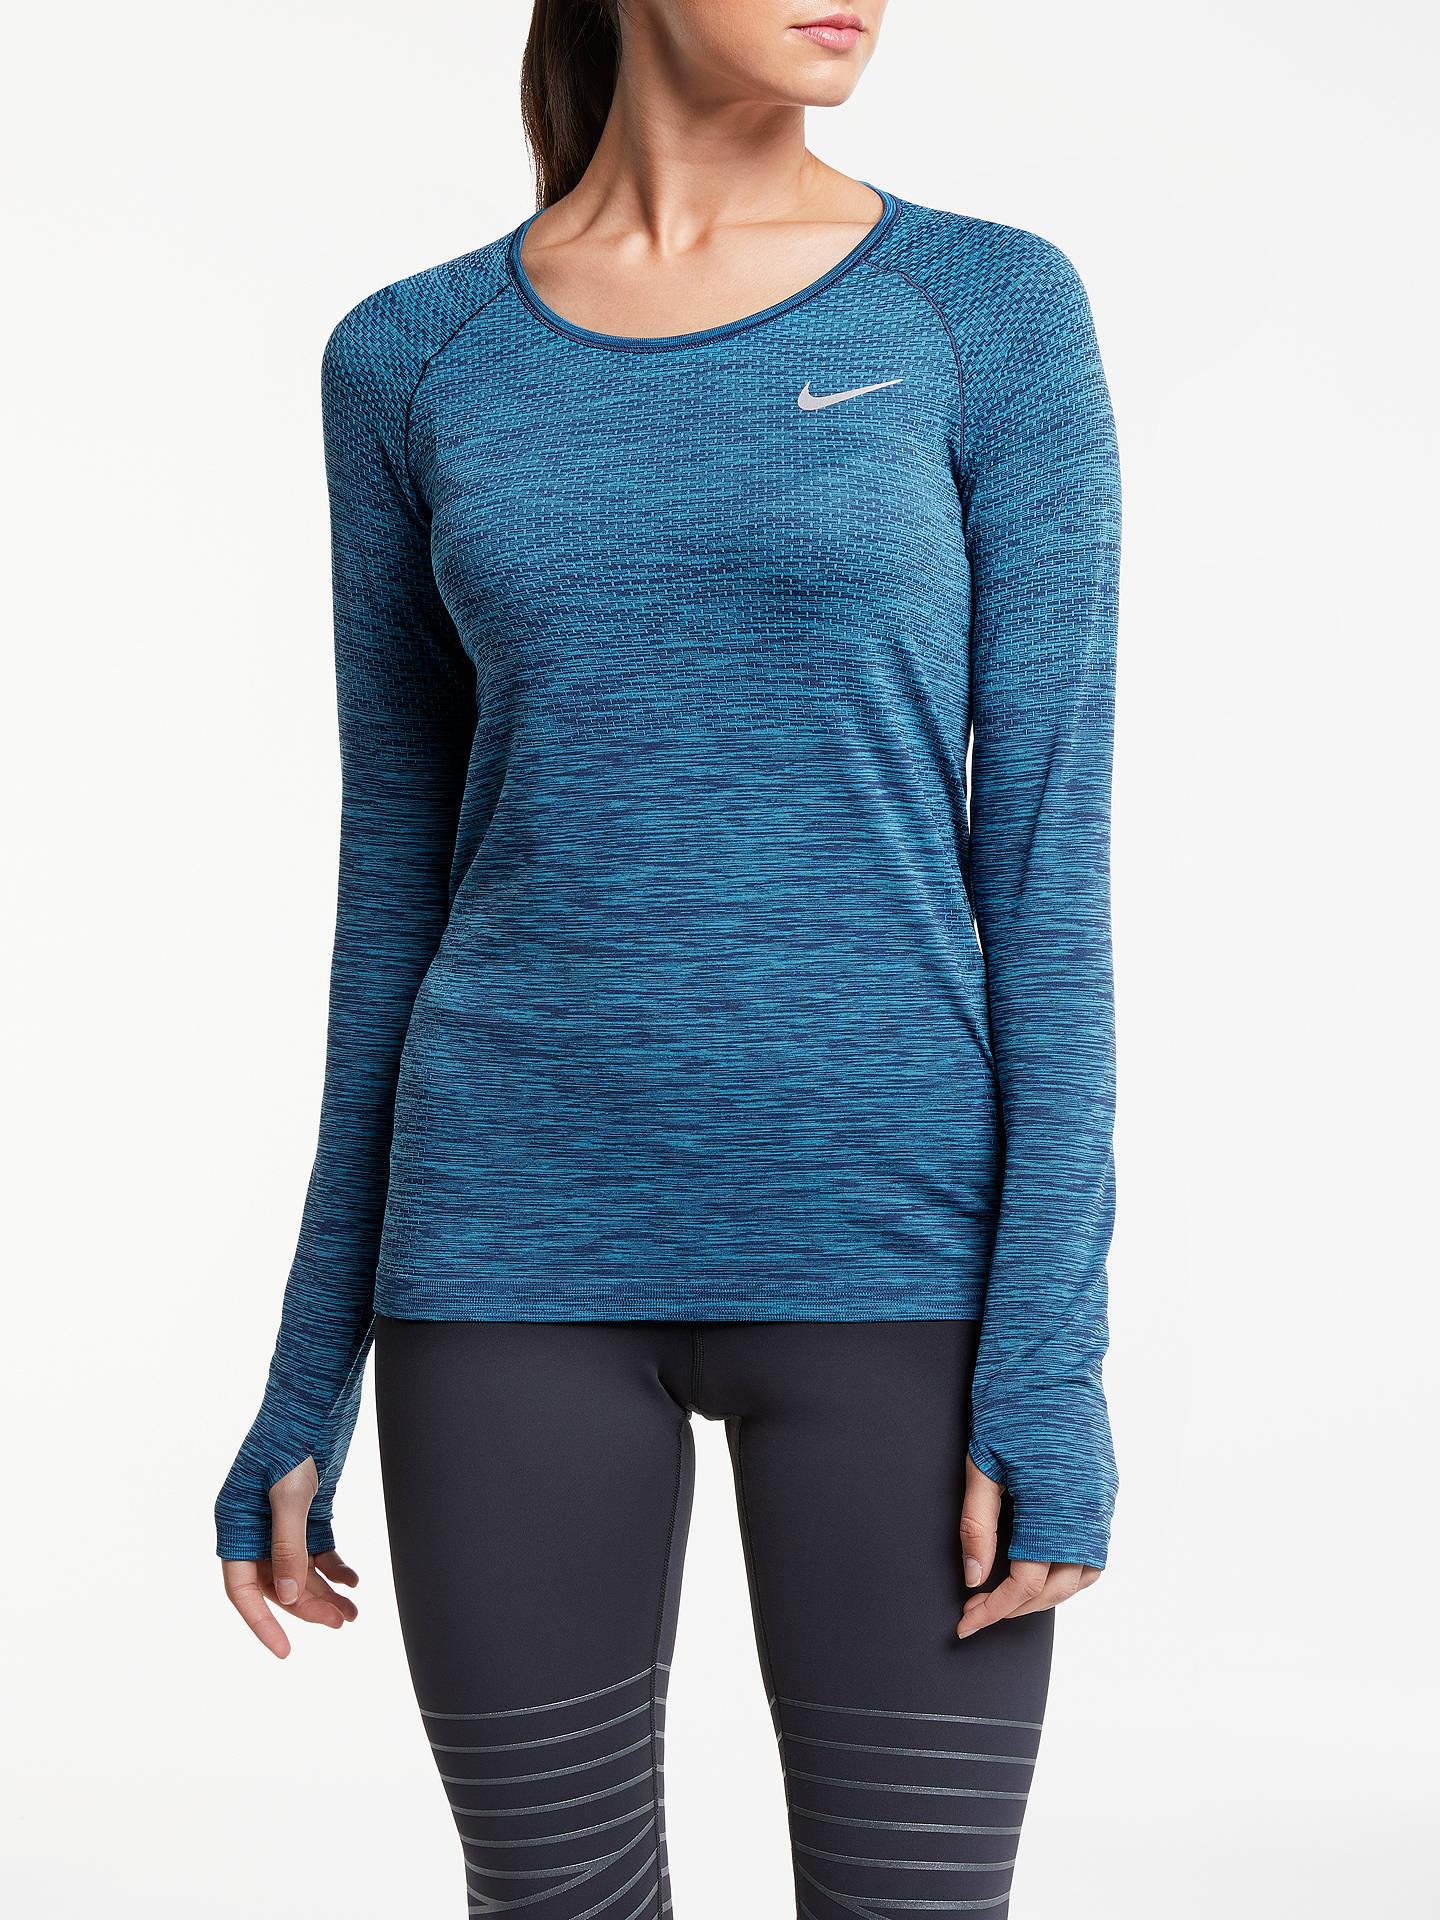 0d53c4153 Buy Nike Dri-FIT Knit Long Sleeve Running Top, Binary Blue/Light Blue ...